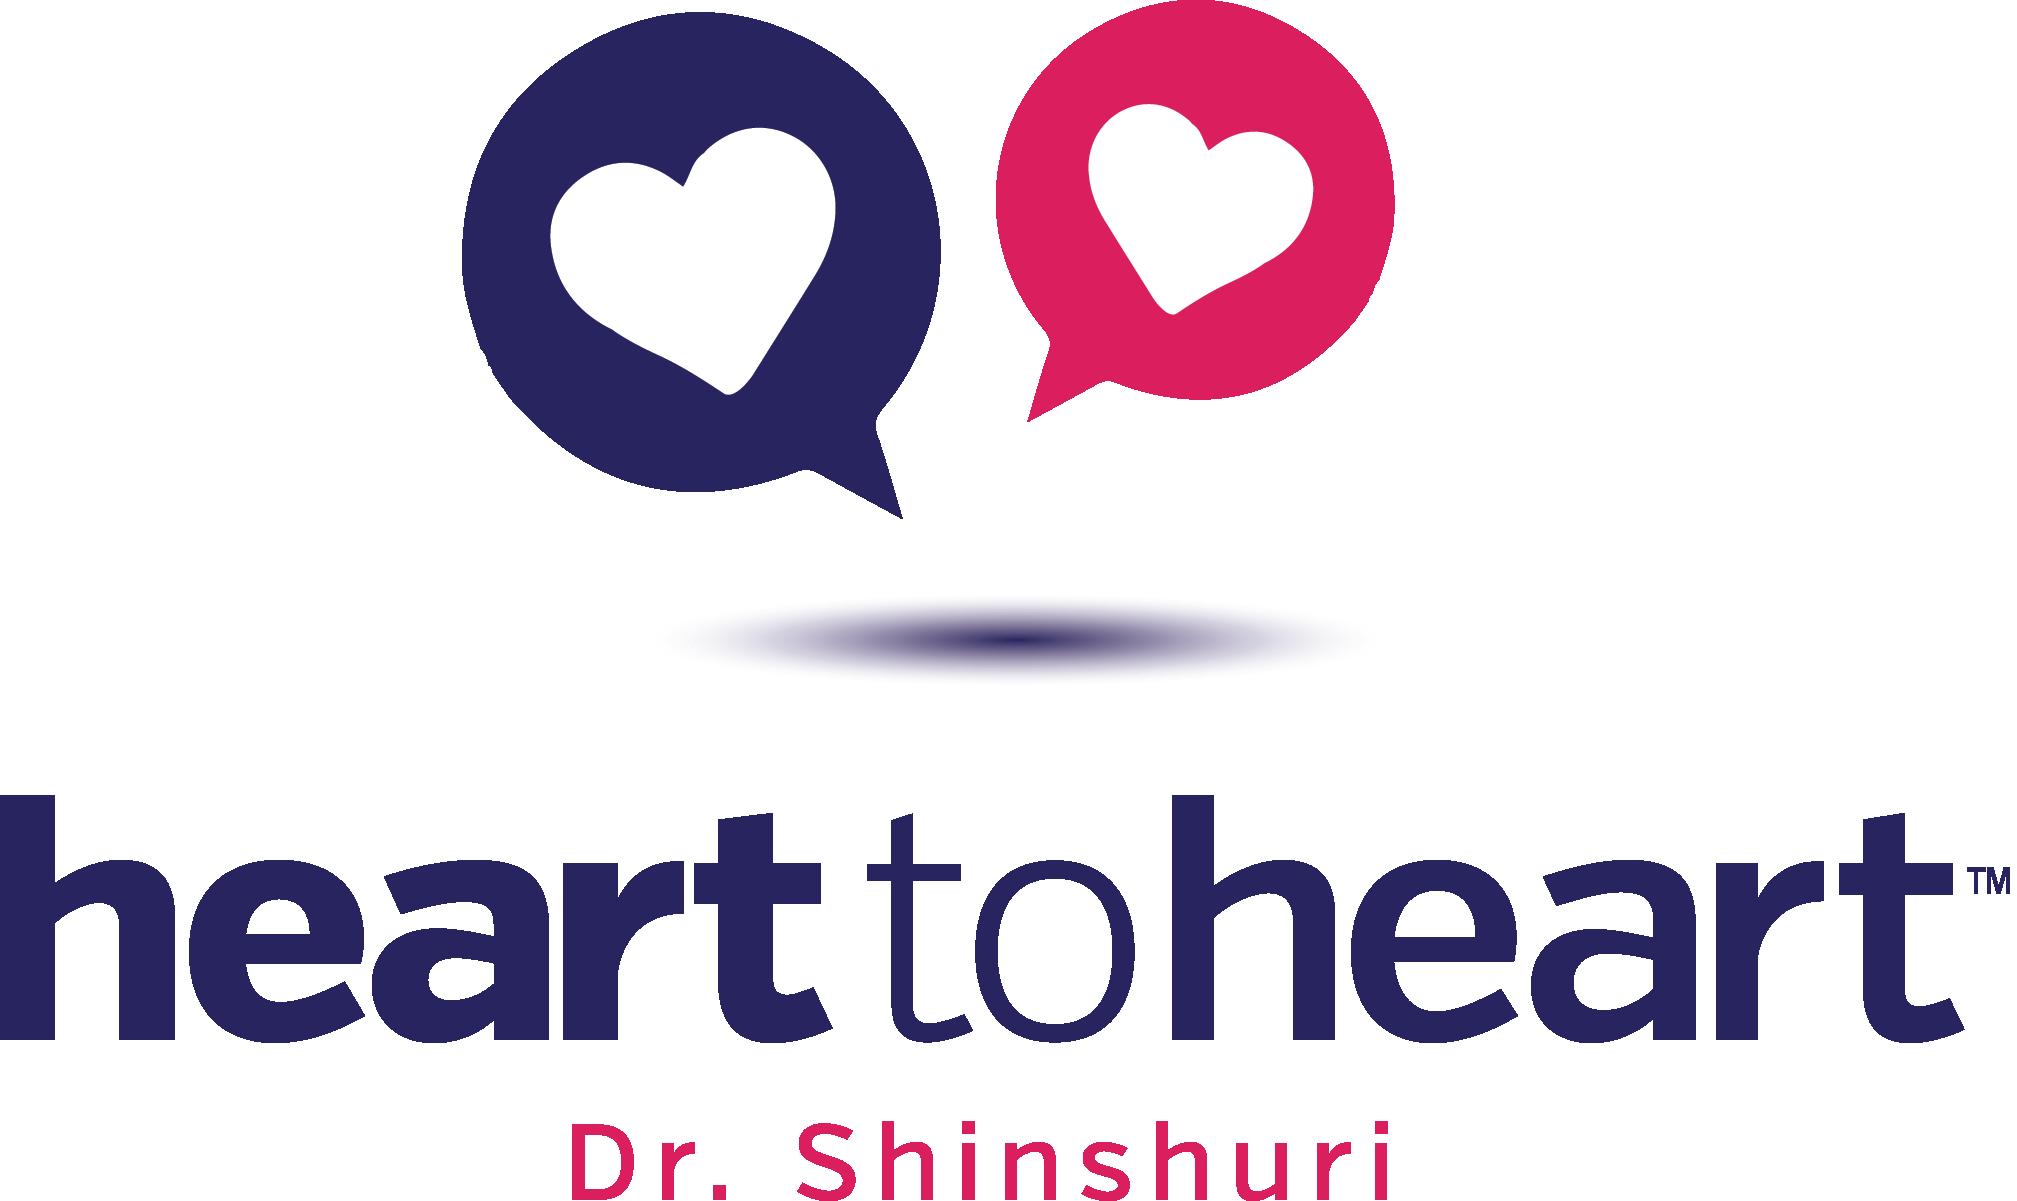 hearttoheartapprovedlogo